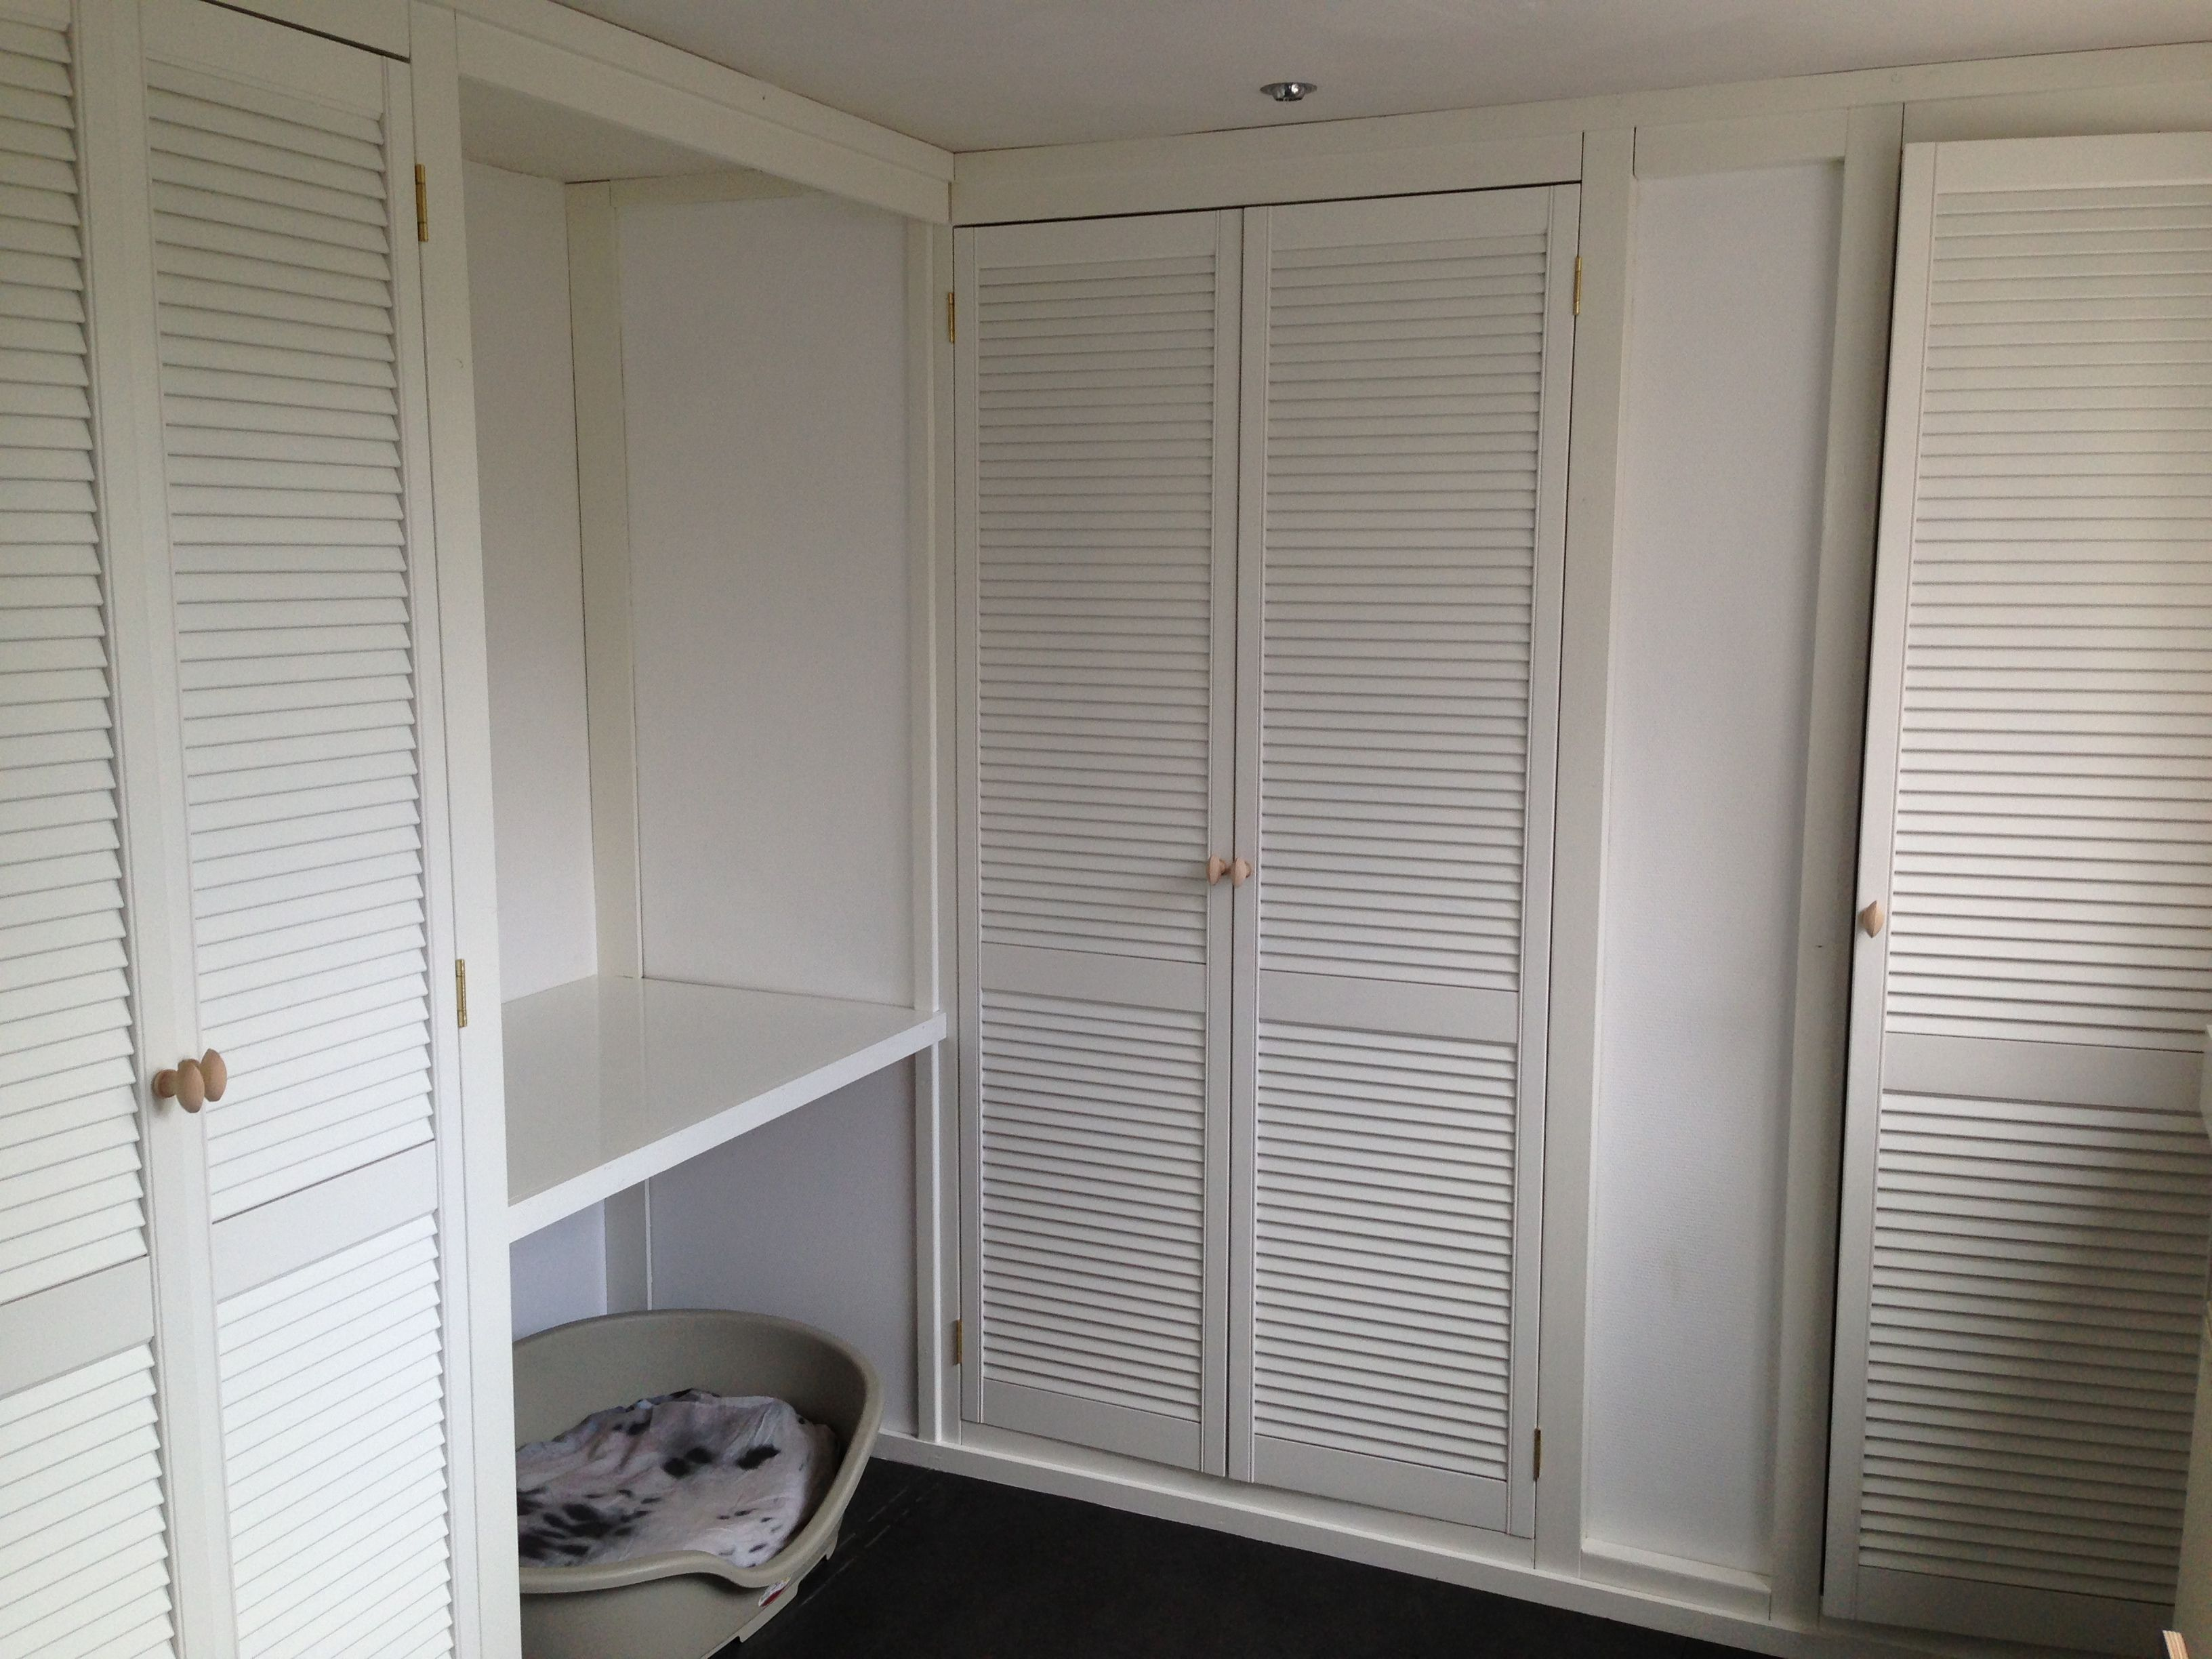 louvre doors ikea ikea louvre doors ex les ideas. Black Bedroom Furniture Sets. Home Design Ideas